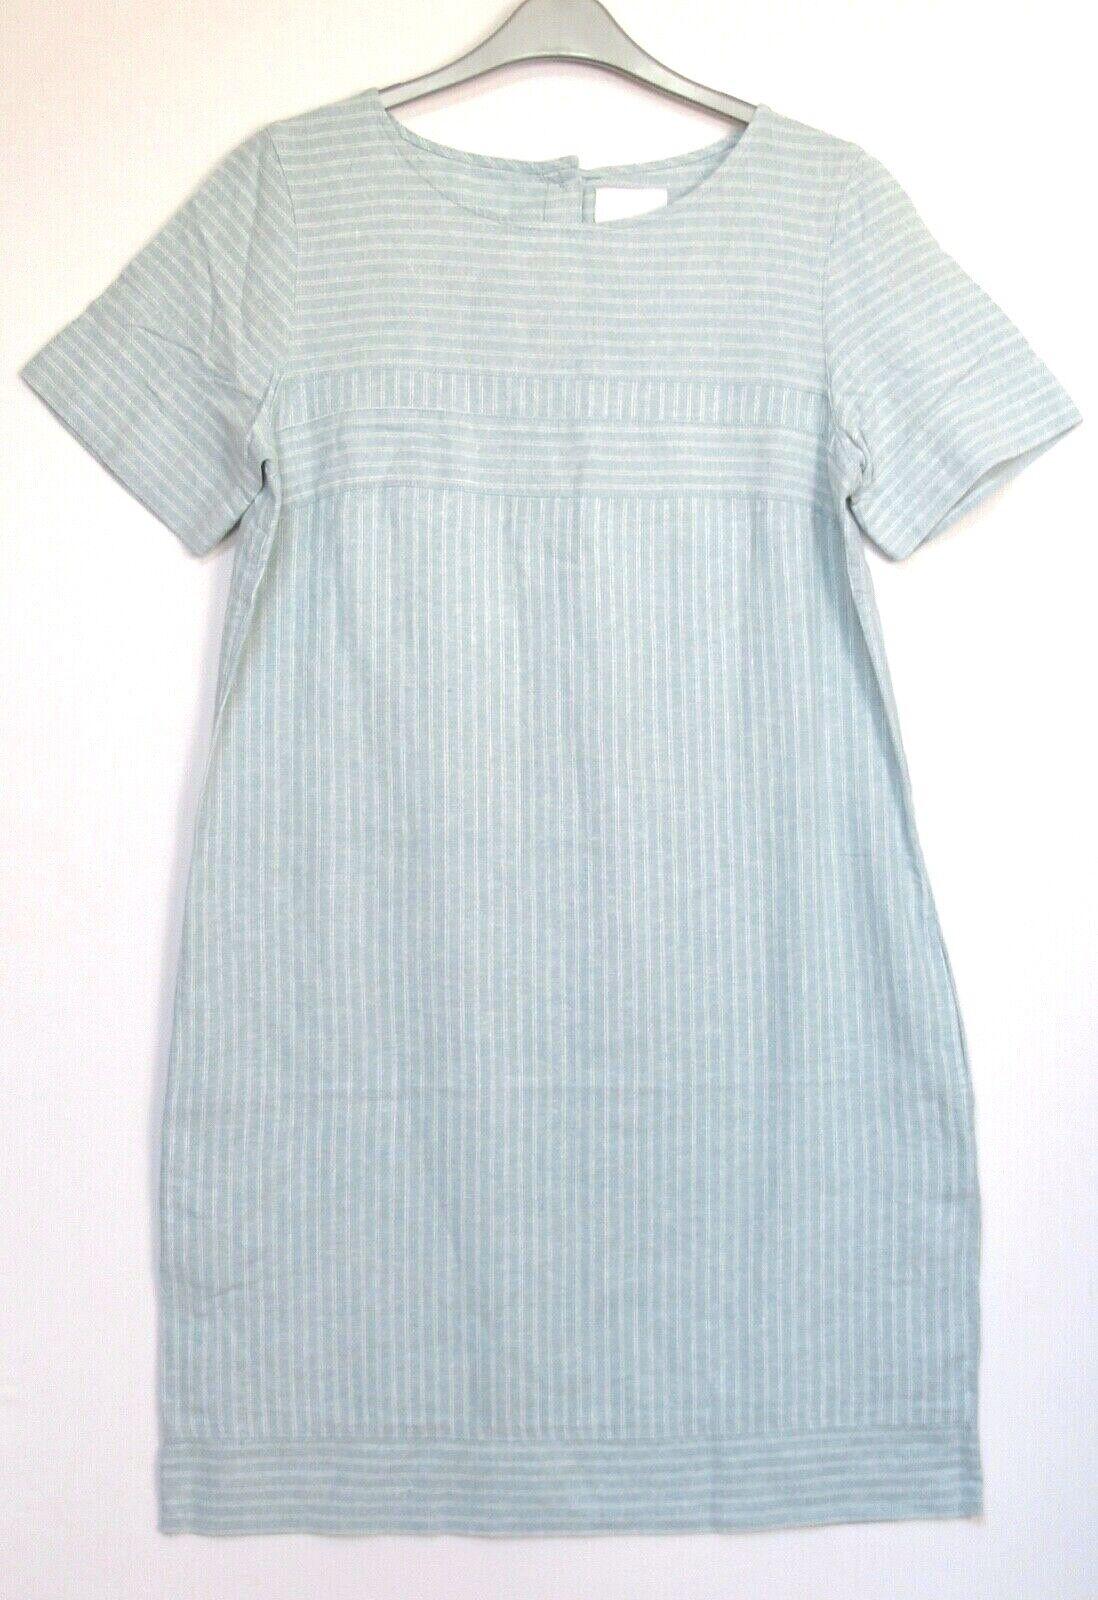 New Next Linen Blend Teal Striped Tunic Summer Holiday Dress - Size 8 - 20